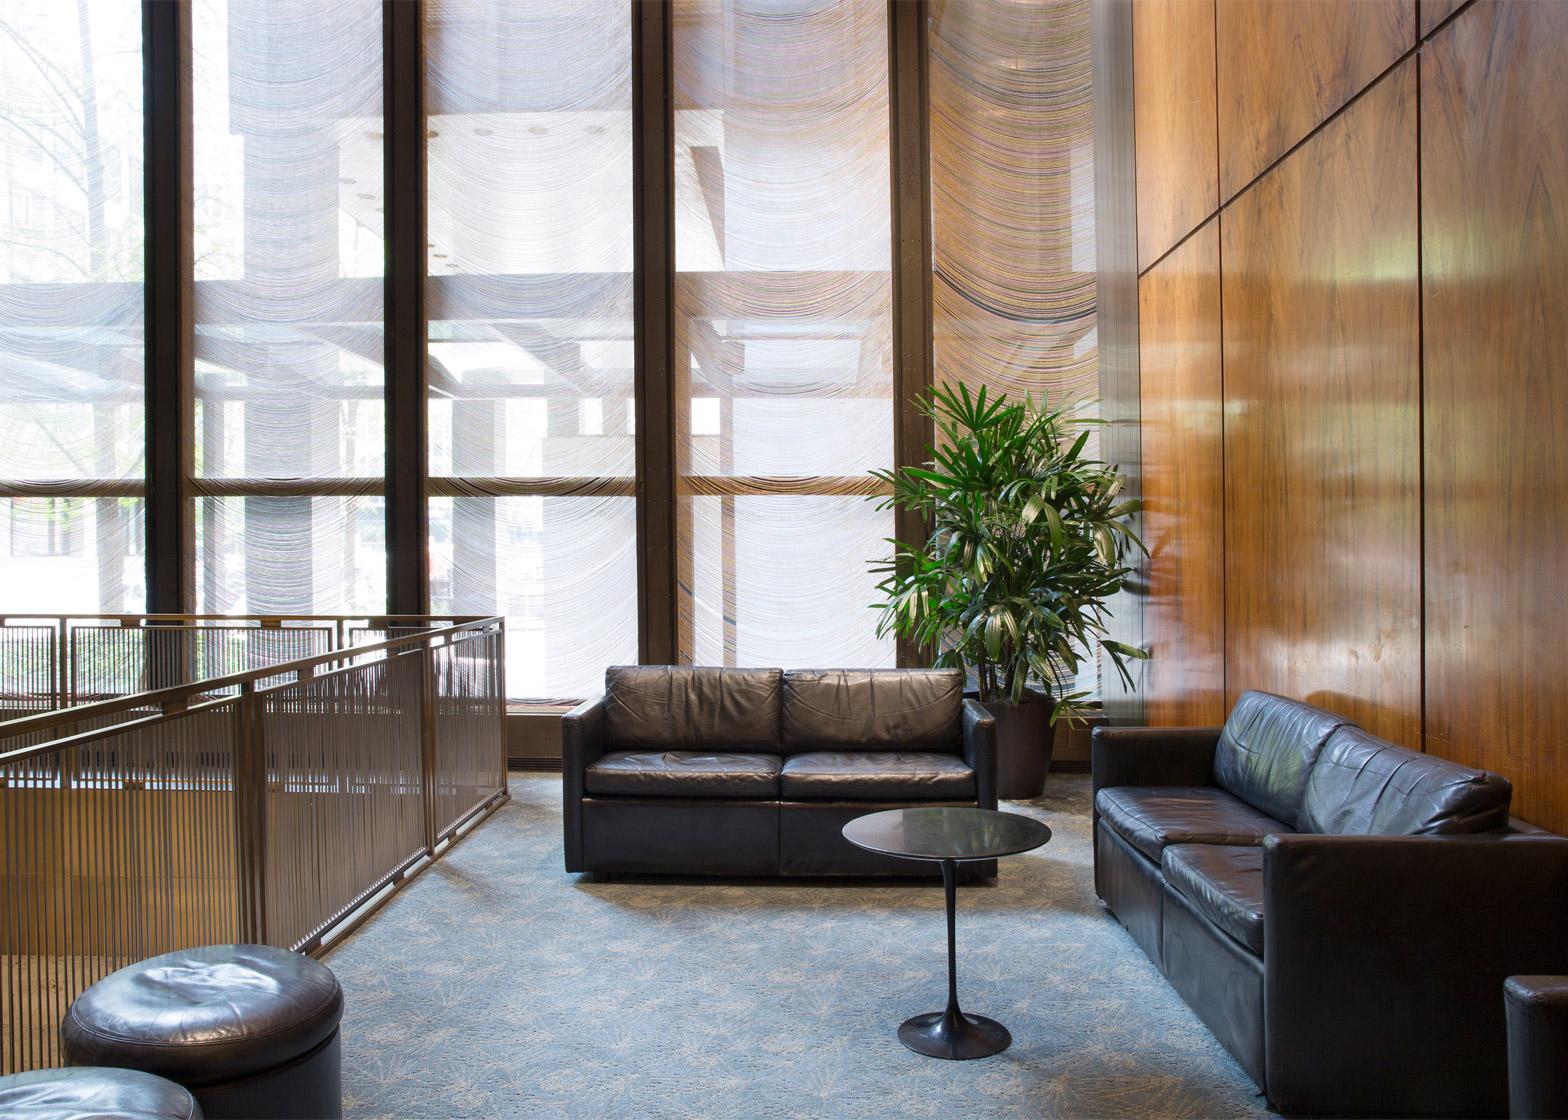 four-seasons-restaurant-interior-seagram-building-philip-johnson-mies-van-der-rohe-auction-new-york-city-usa-news_dezeen_1568_8